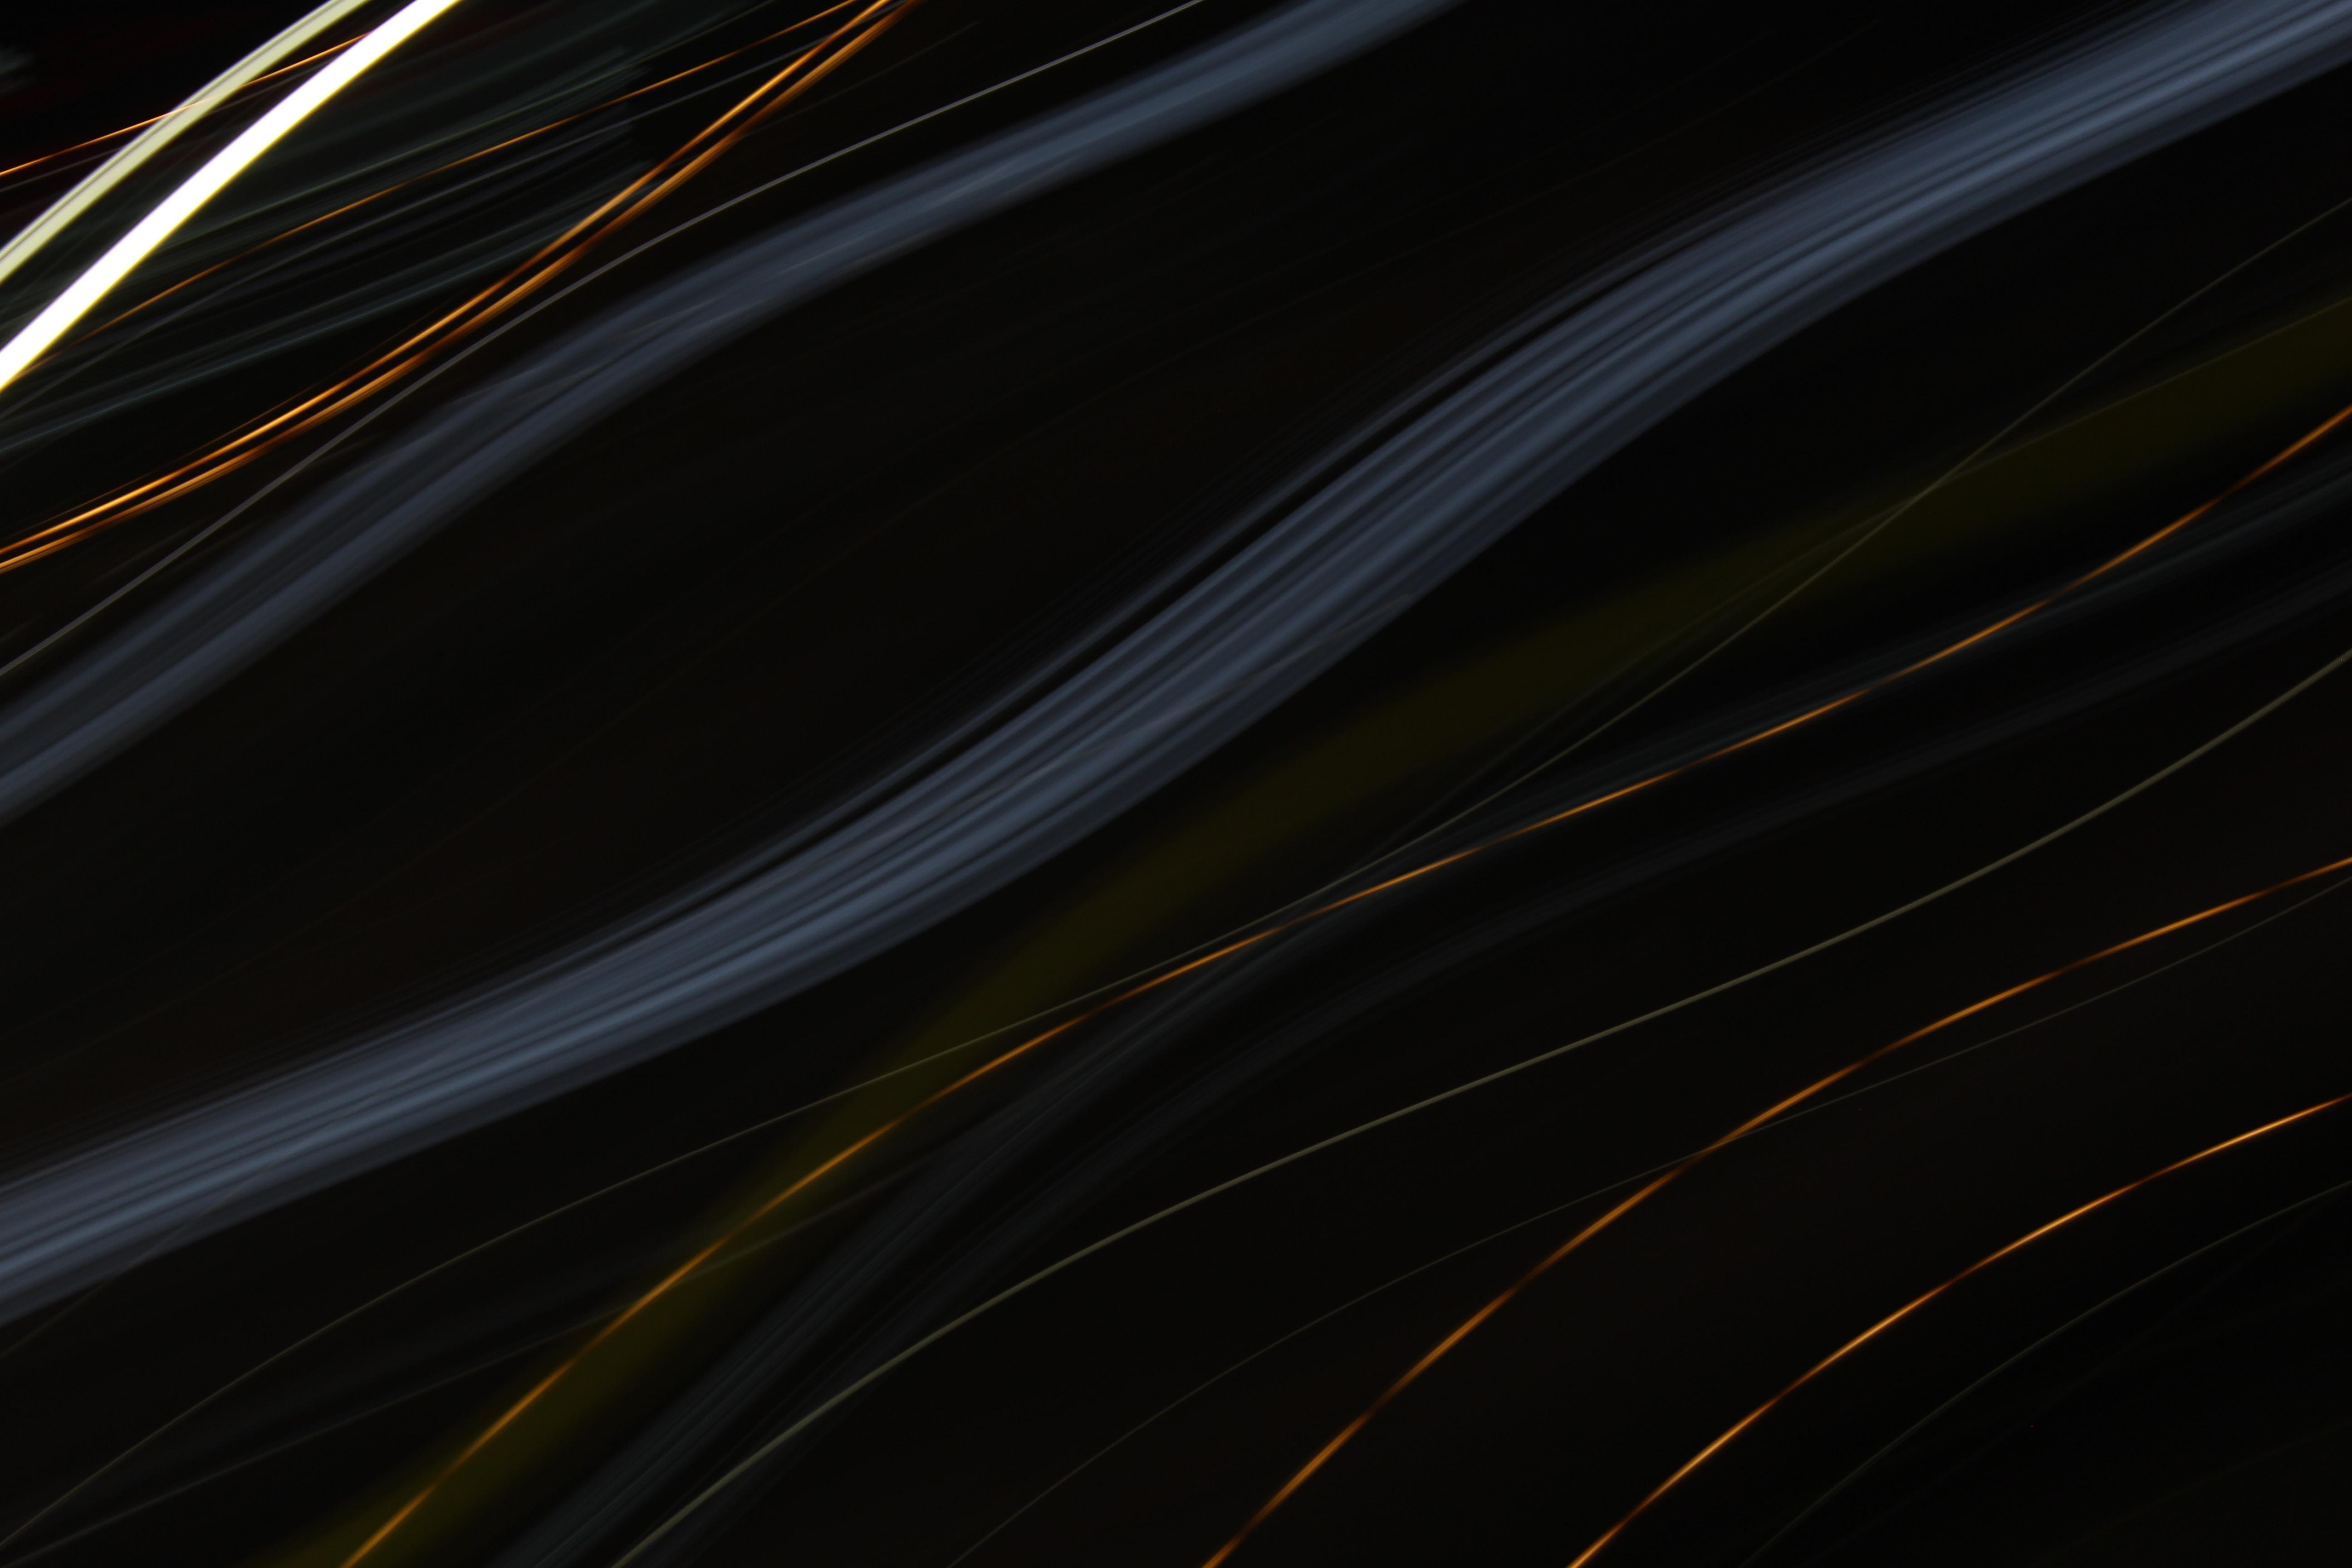 abstract light facing 1575660264 - Abstract Light Facing -